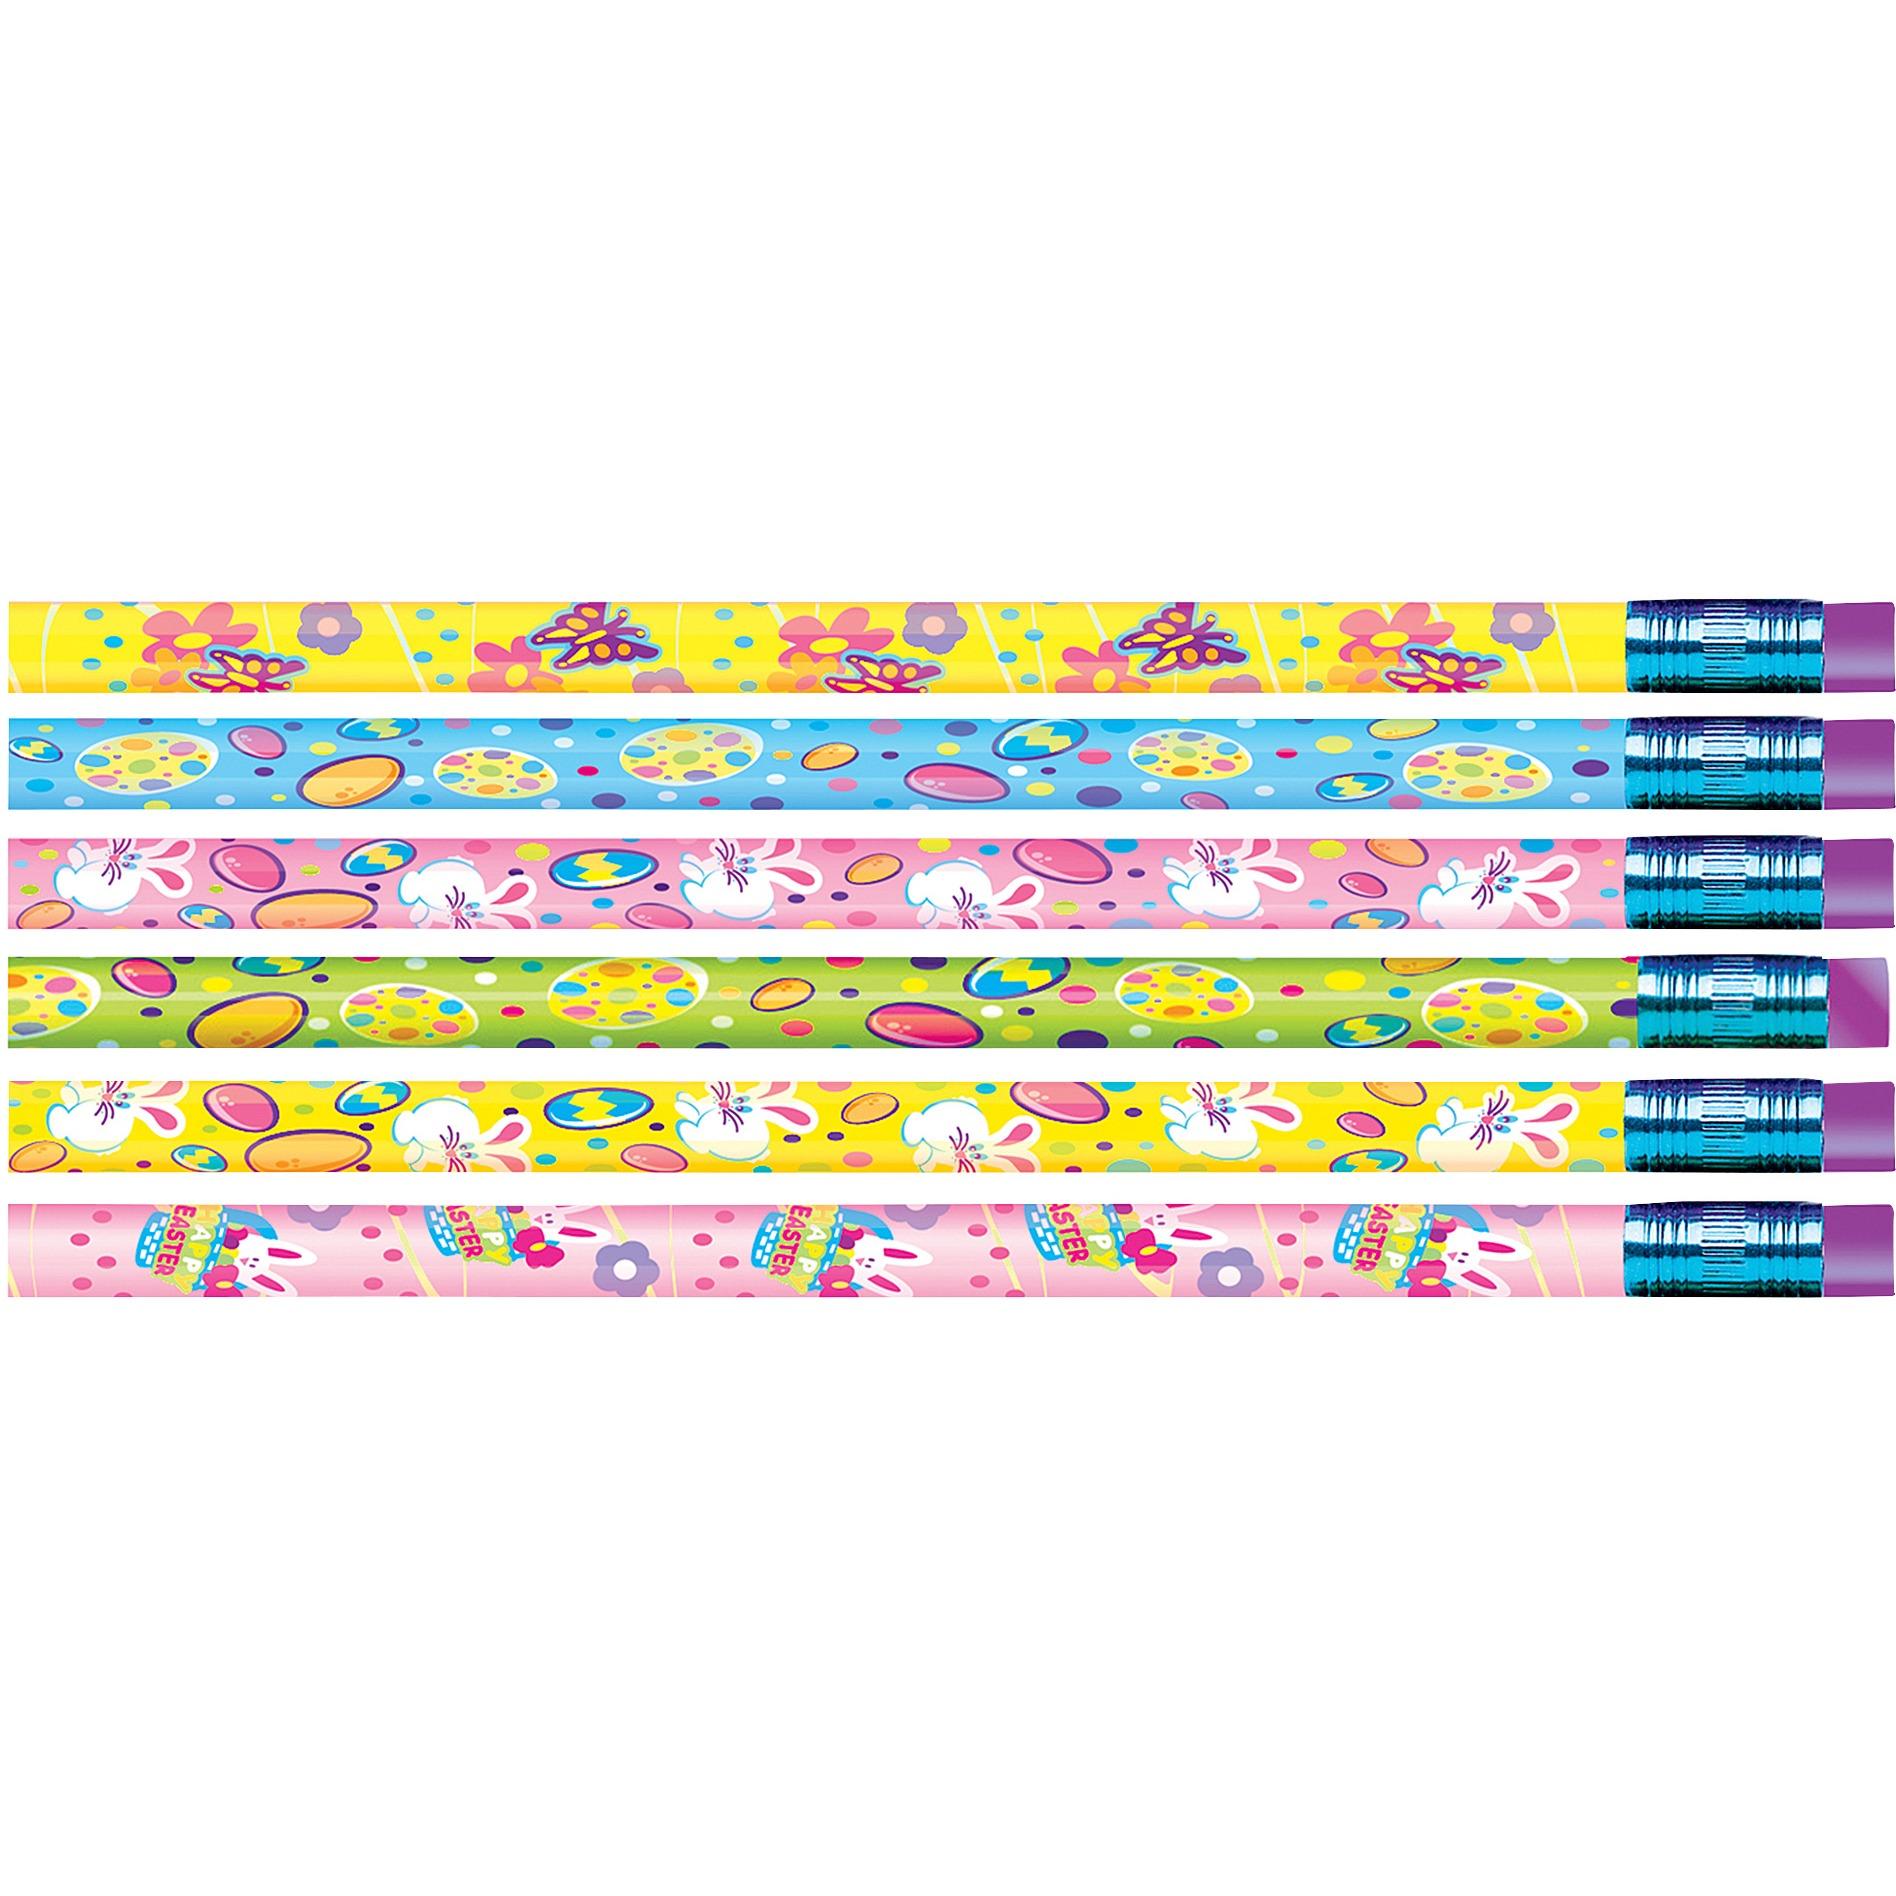 Moon Products, MPD52024B, Springtime Easter Design Pencils, 1 Dozen